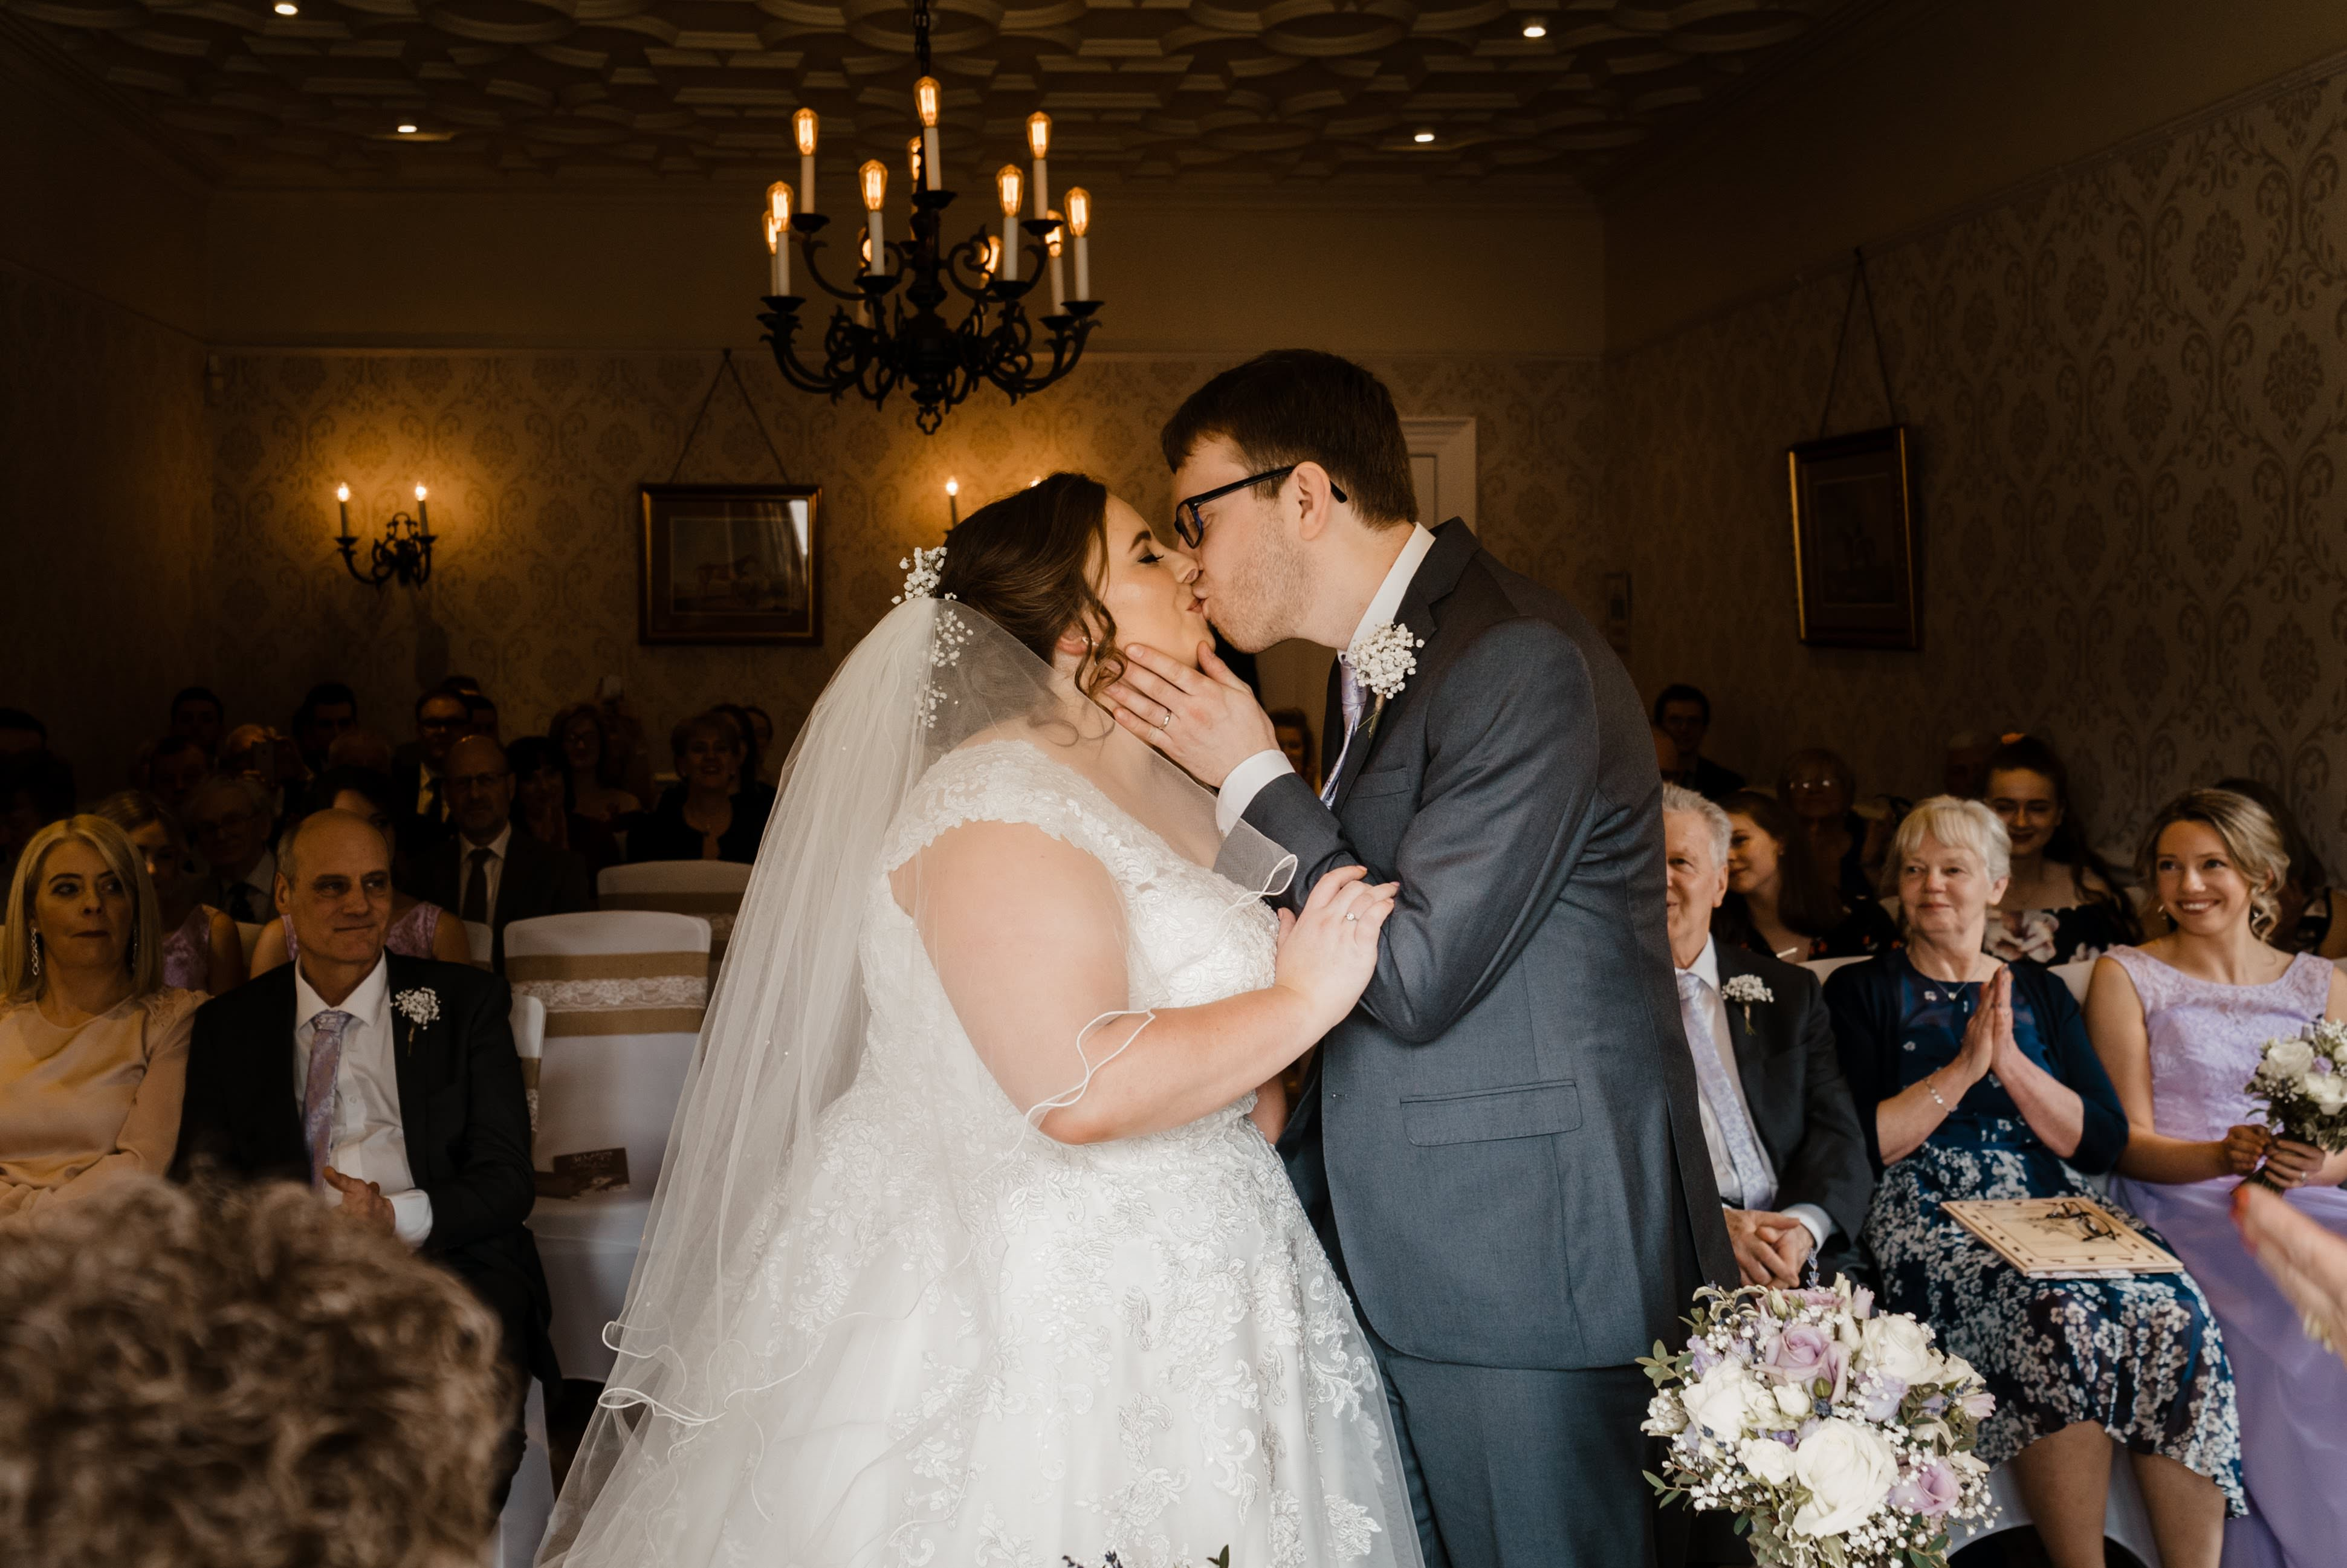 Weetwood Hall Wedding Leeds 1 - Sneak Peek - Jessica & Jonathan  Weetwood Hall Wedding Leeds